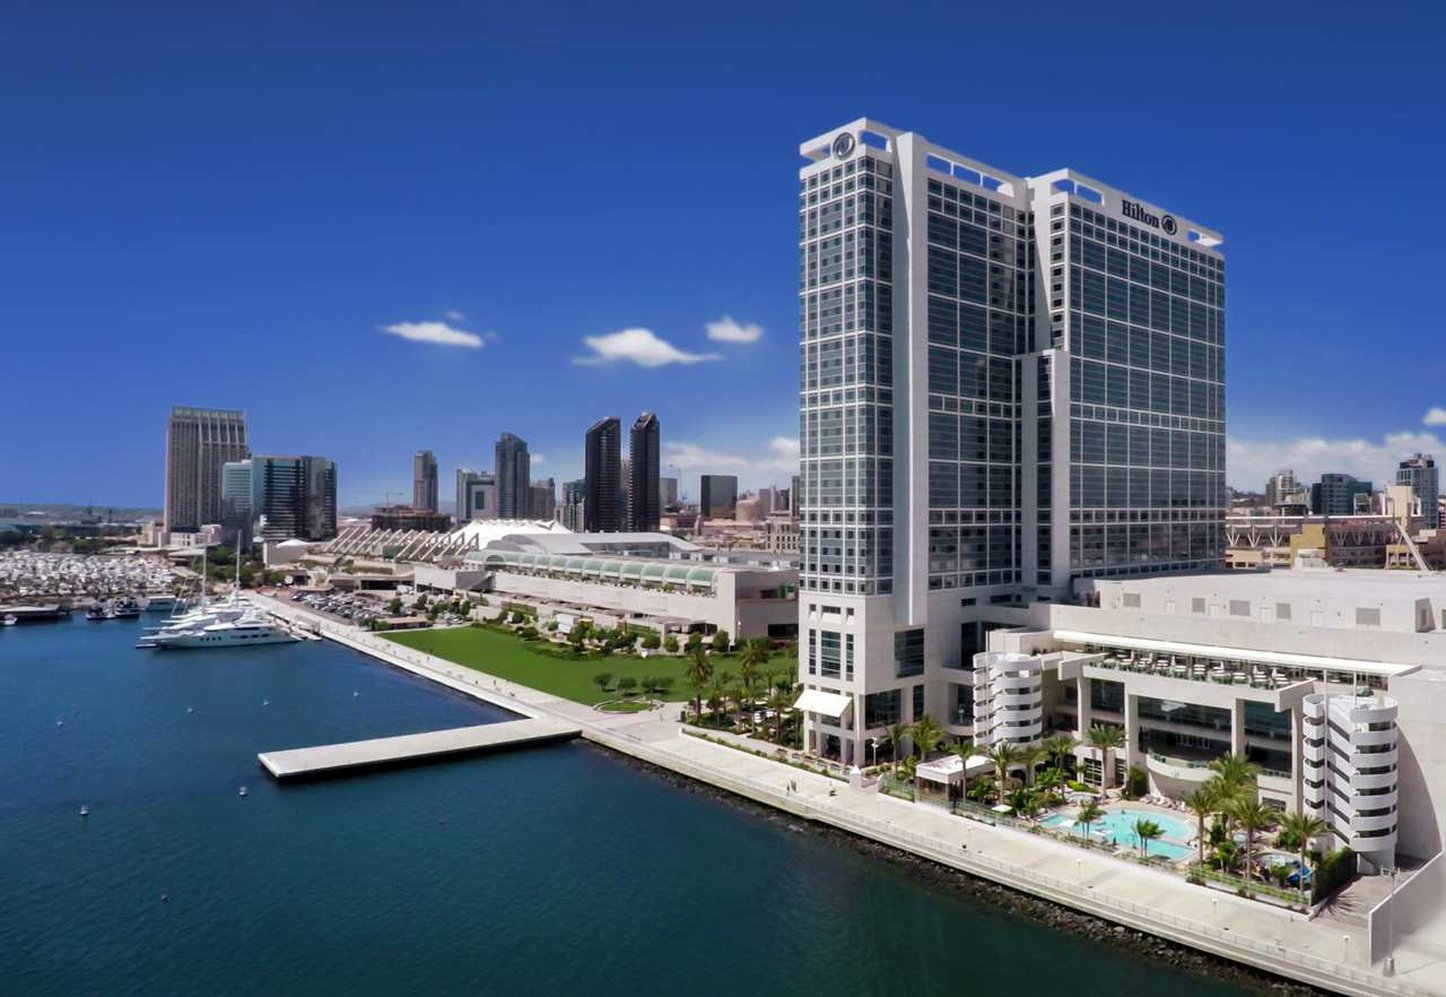 Pet Friendly Hilton Hotels San Diego